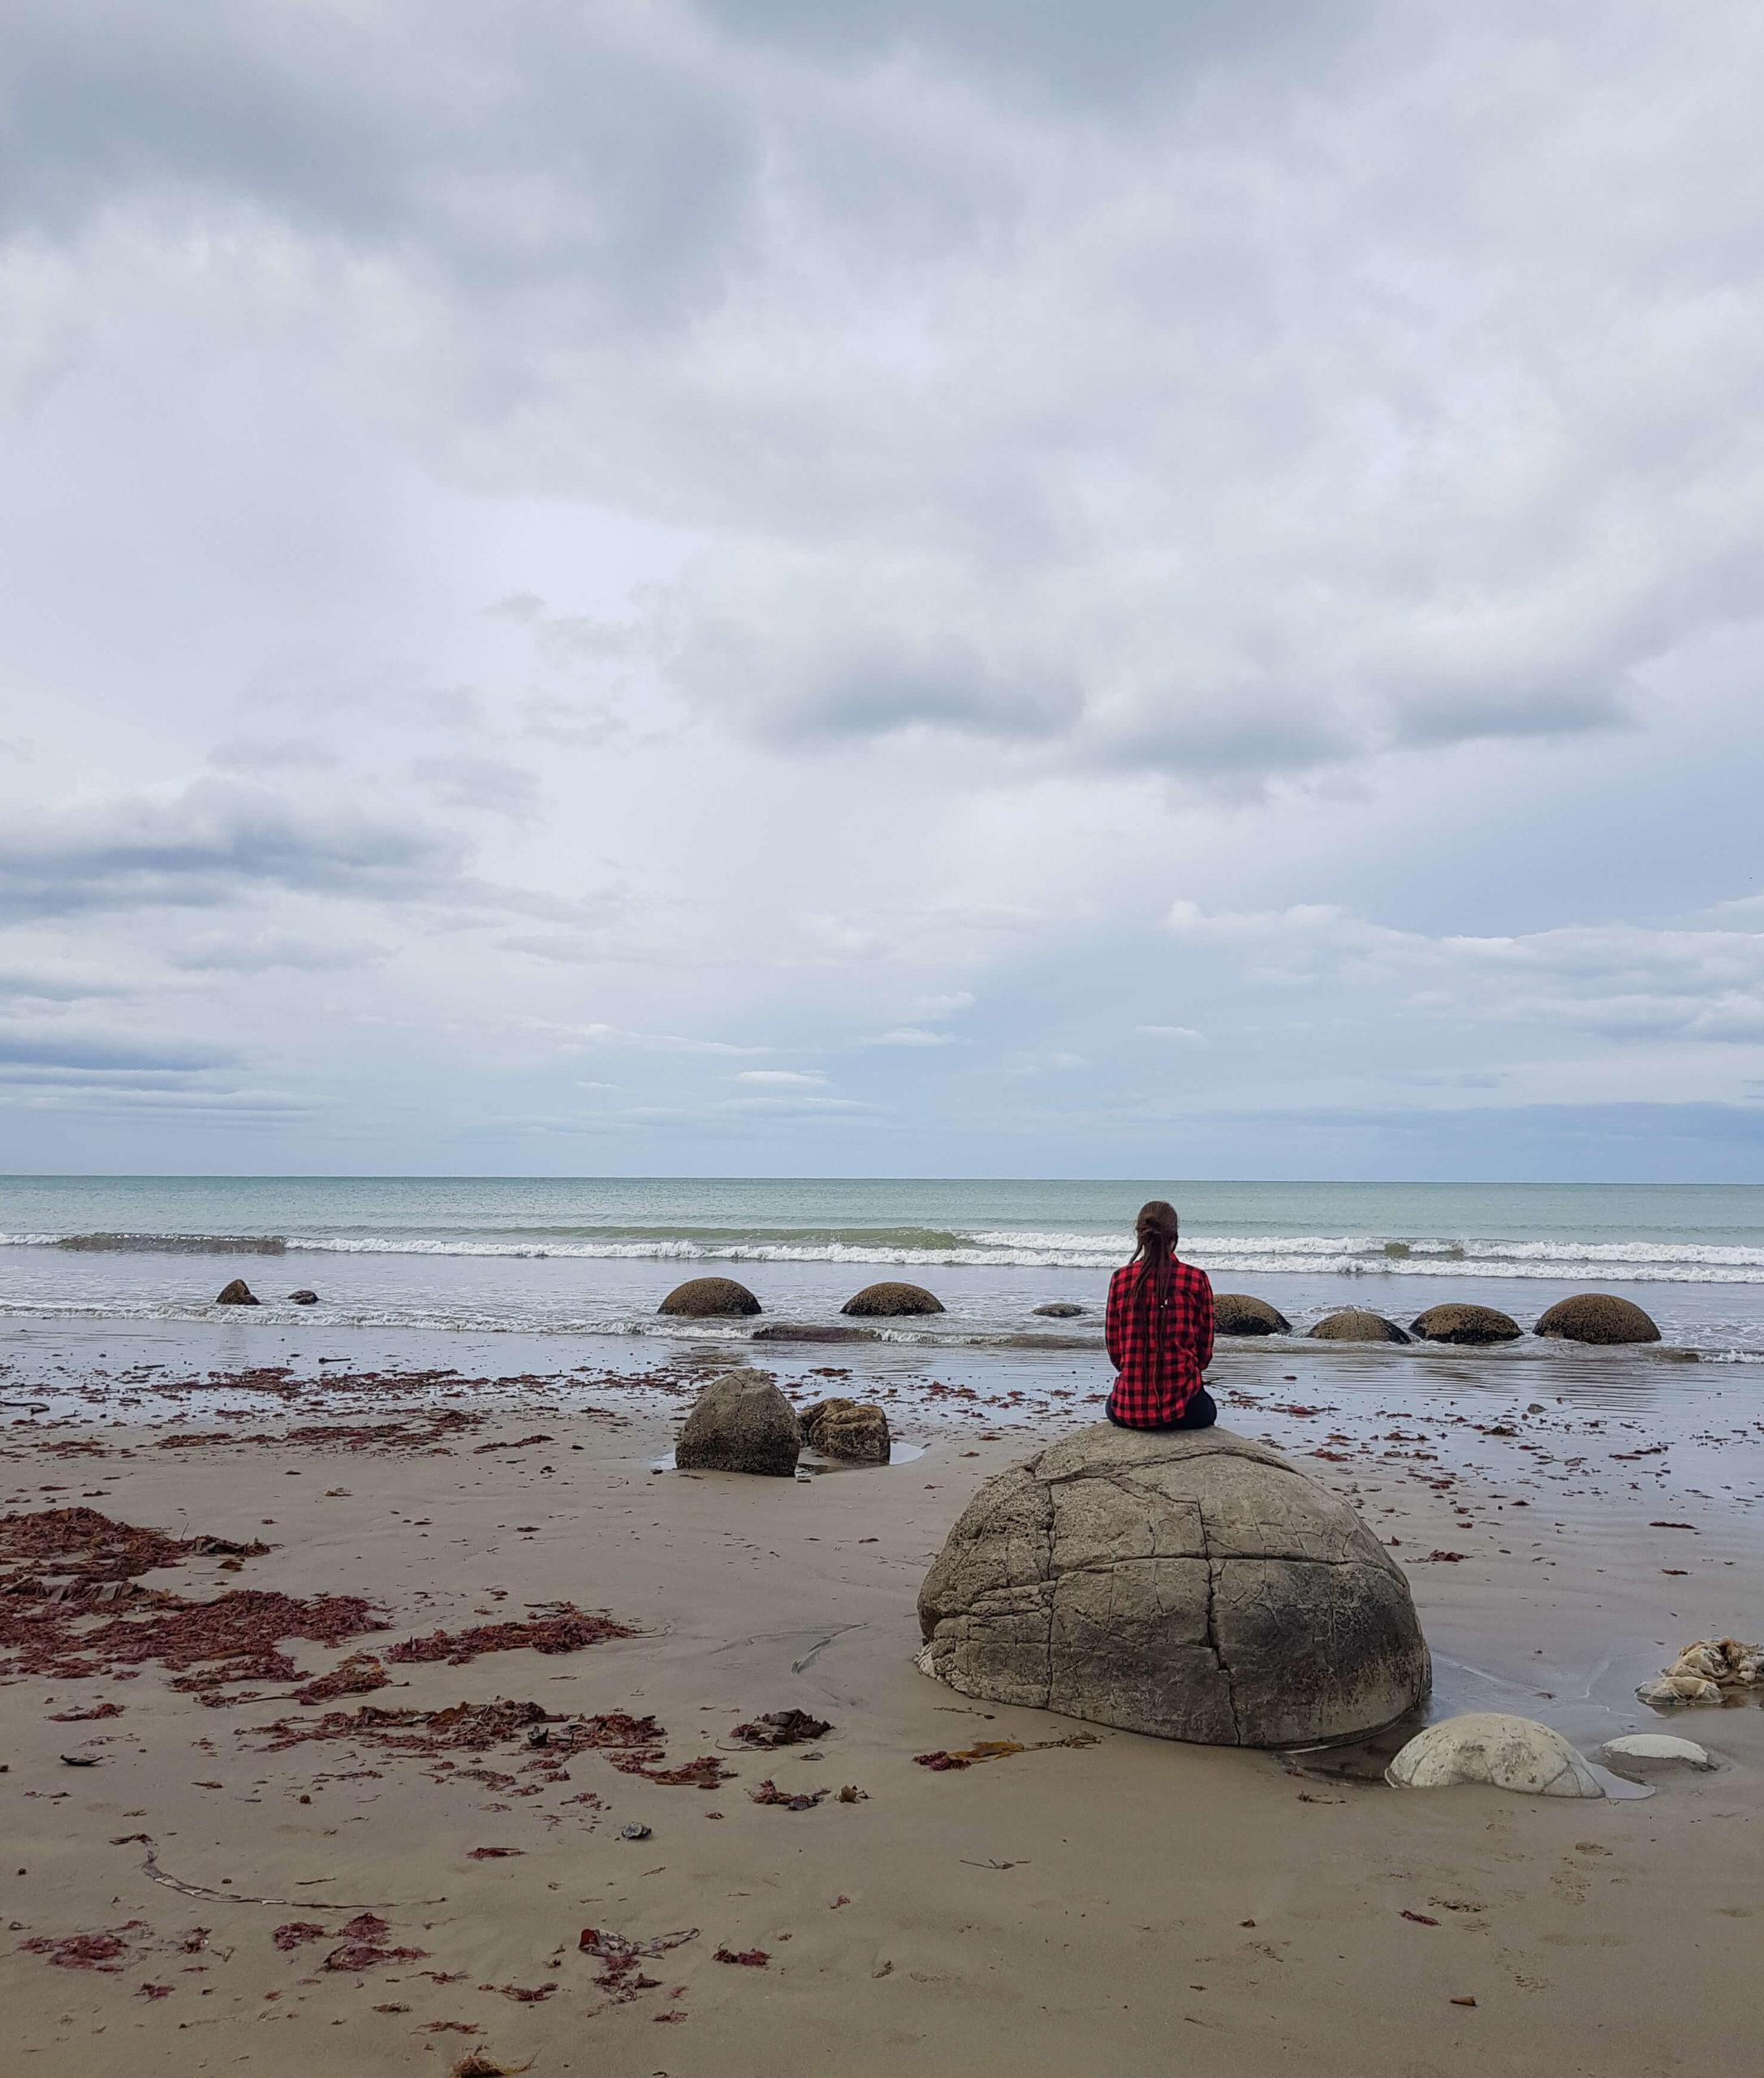 Meeriwild Moeraki boulders Nouvelle-Zélande